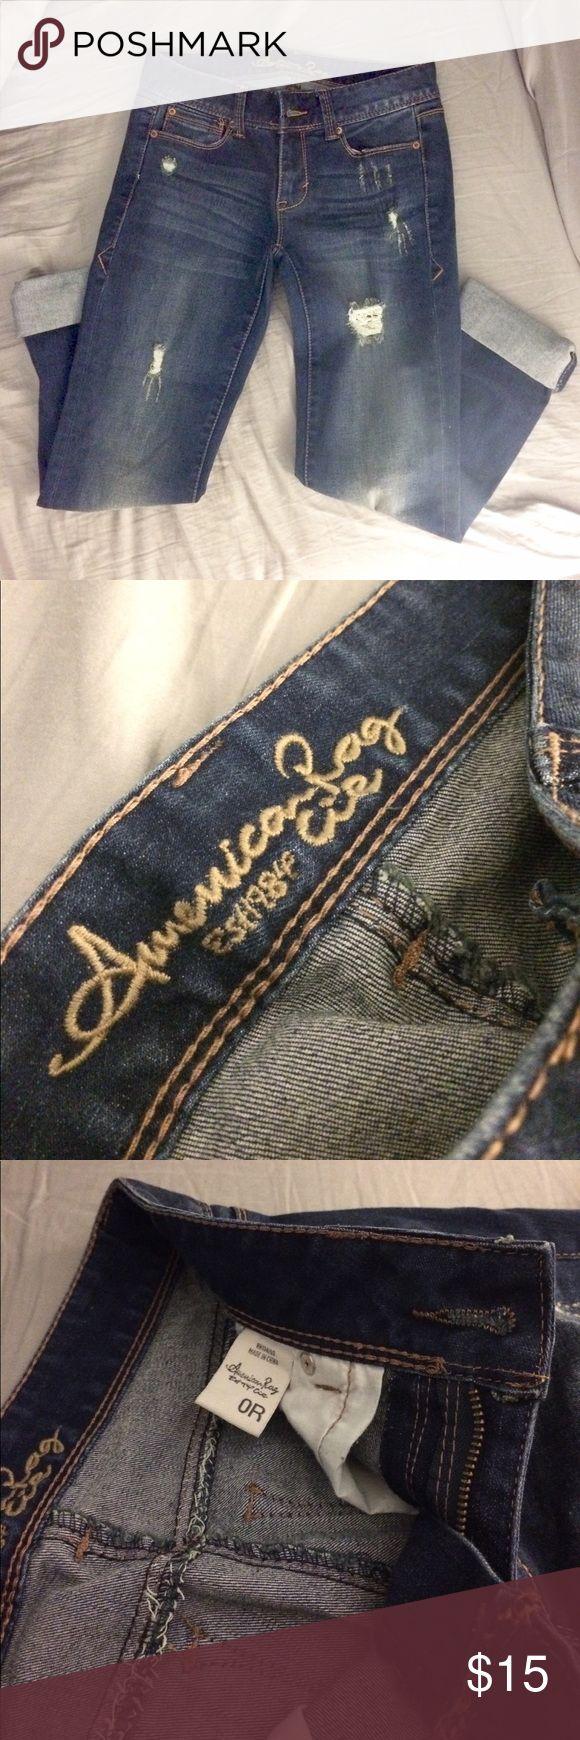 American Rag Jeans • NWOT • brand new never worn • perfect condition • American Rag jeans • mom jeans that fit a little like skinny jeans • American Rag Jeans Straight Leg